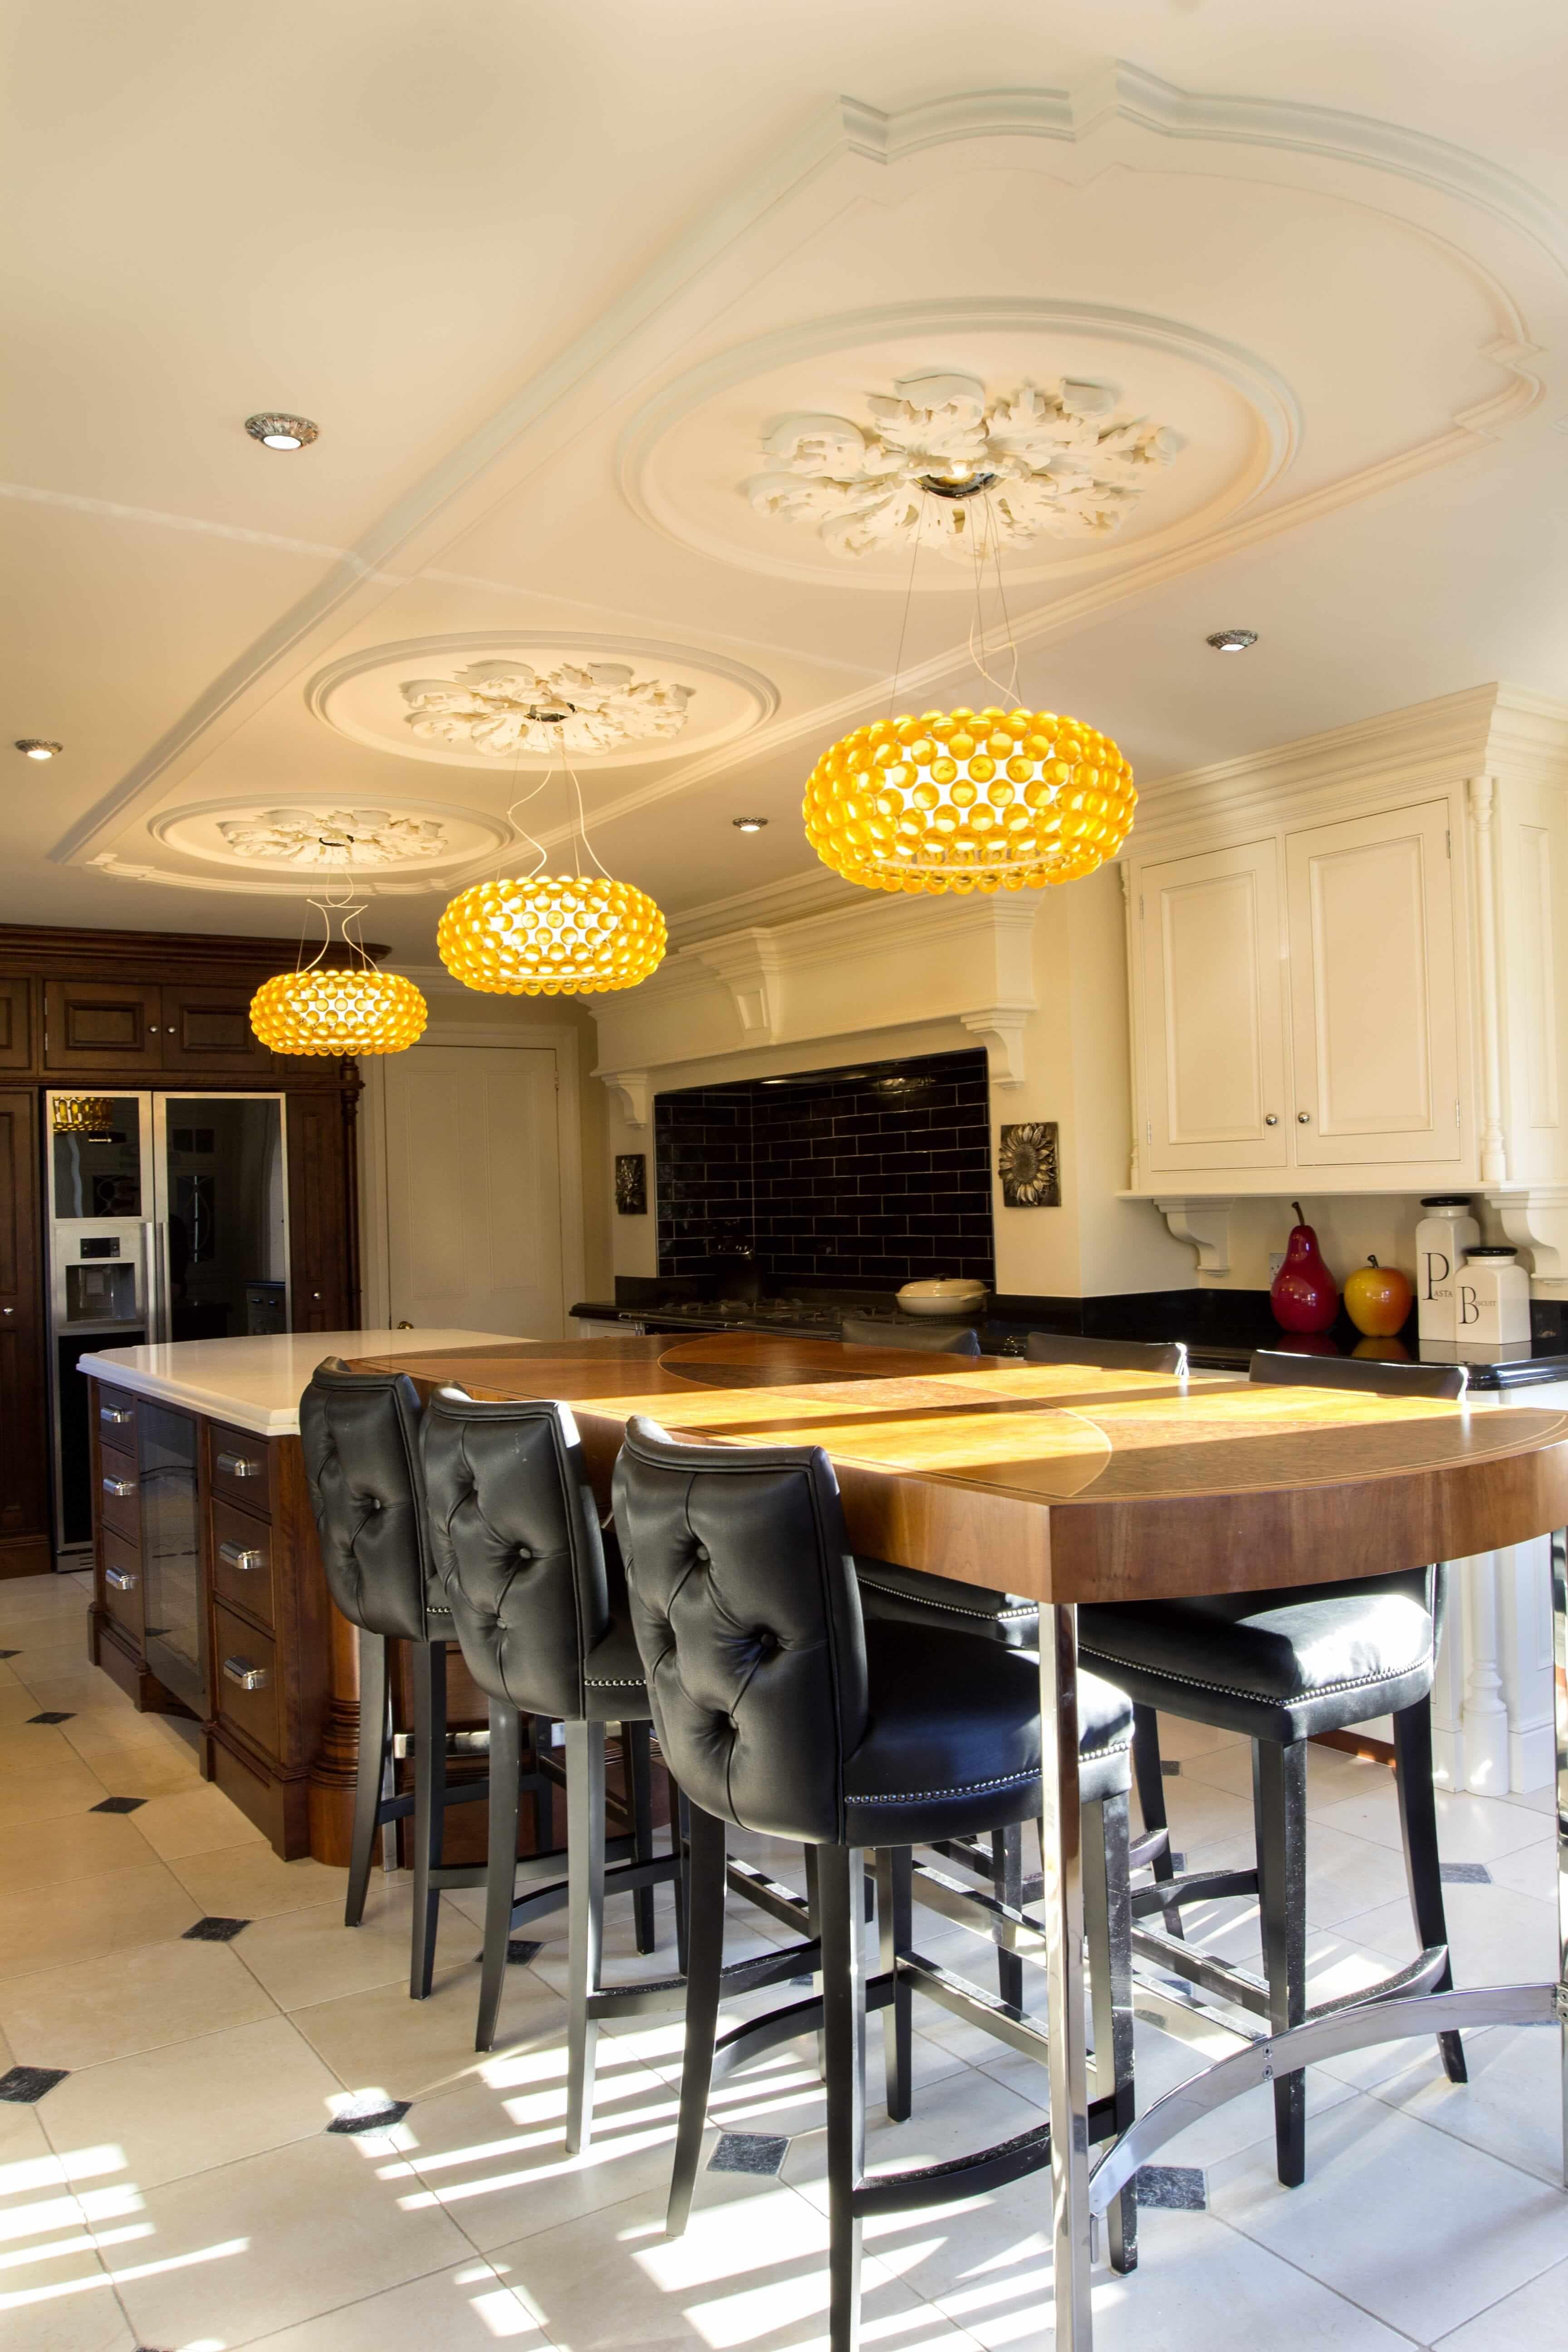 Kitchen Design, Traditional Kitchen, Ceiling Medallions